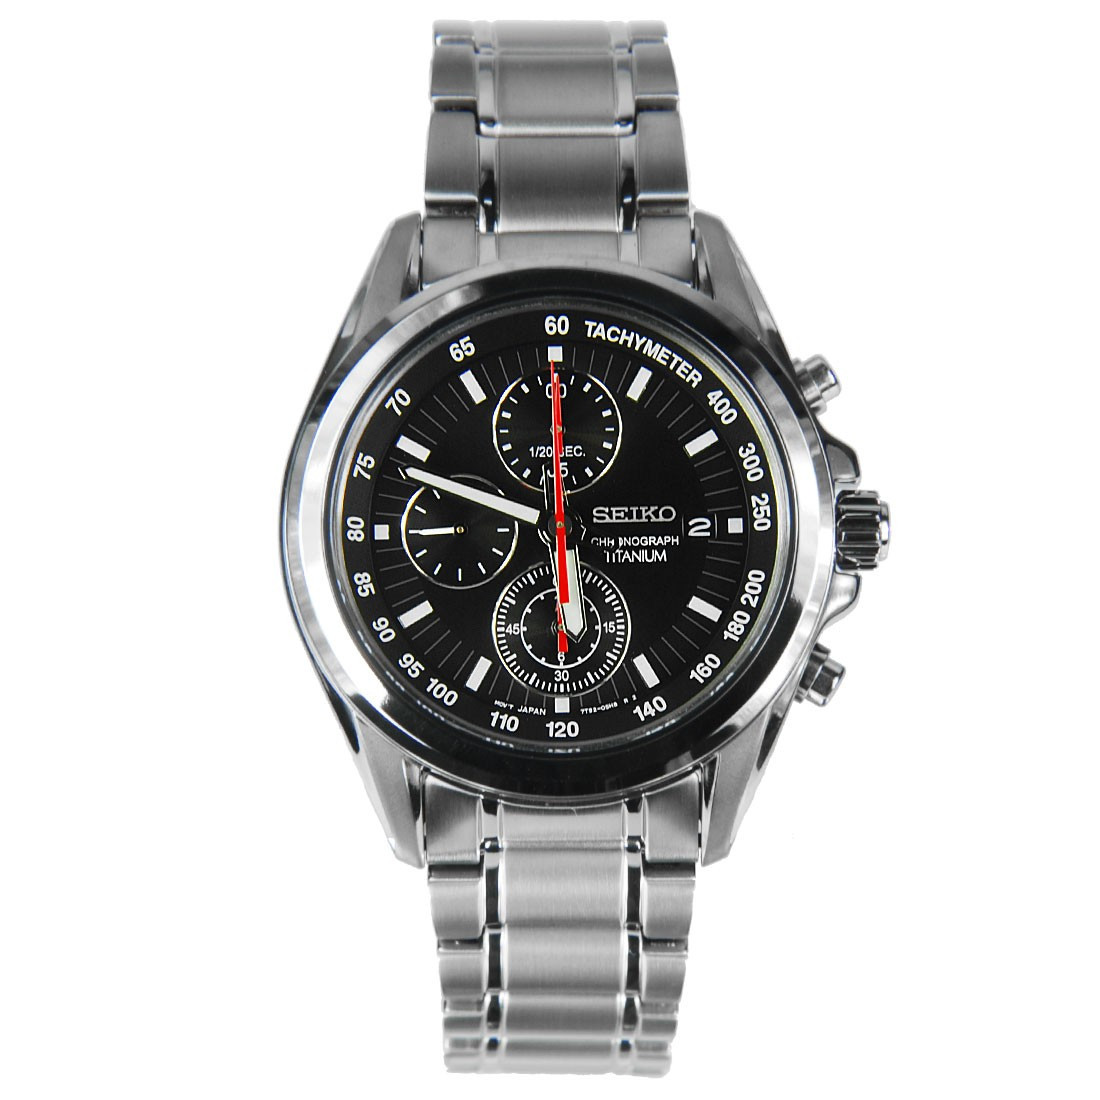 Часы Seiko SNDC93P1 хронограф Titanium